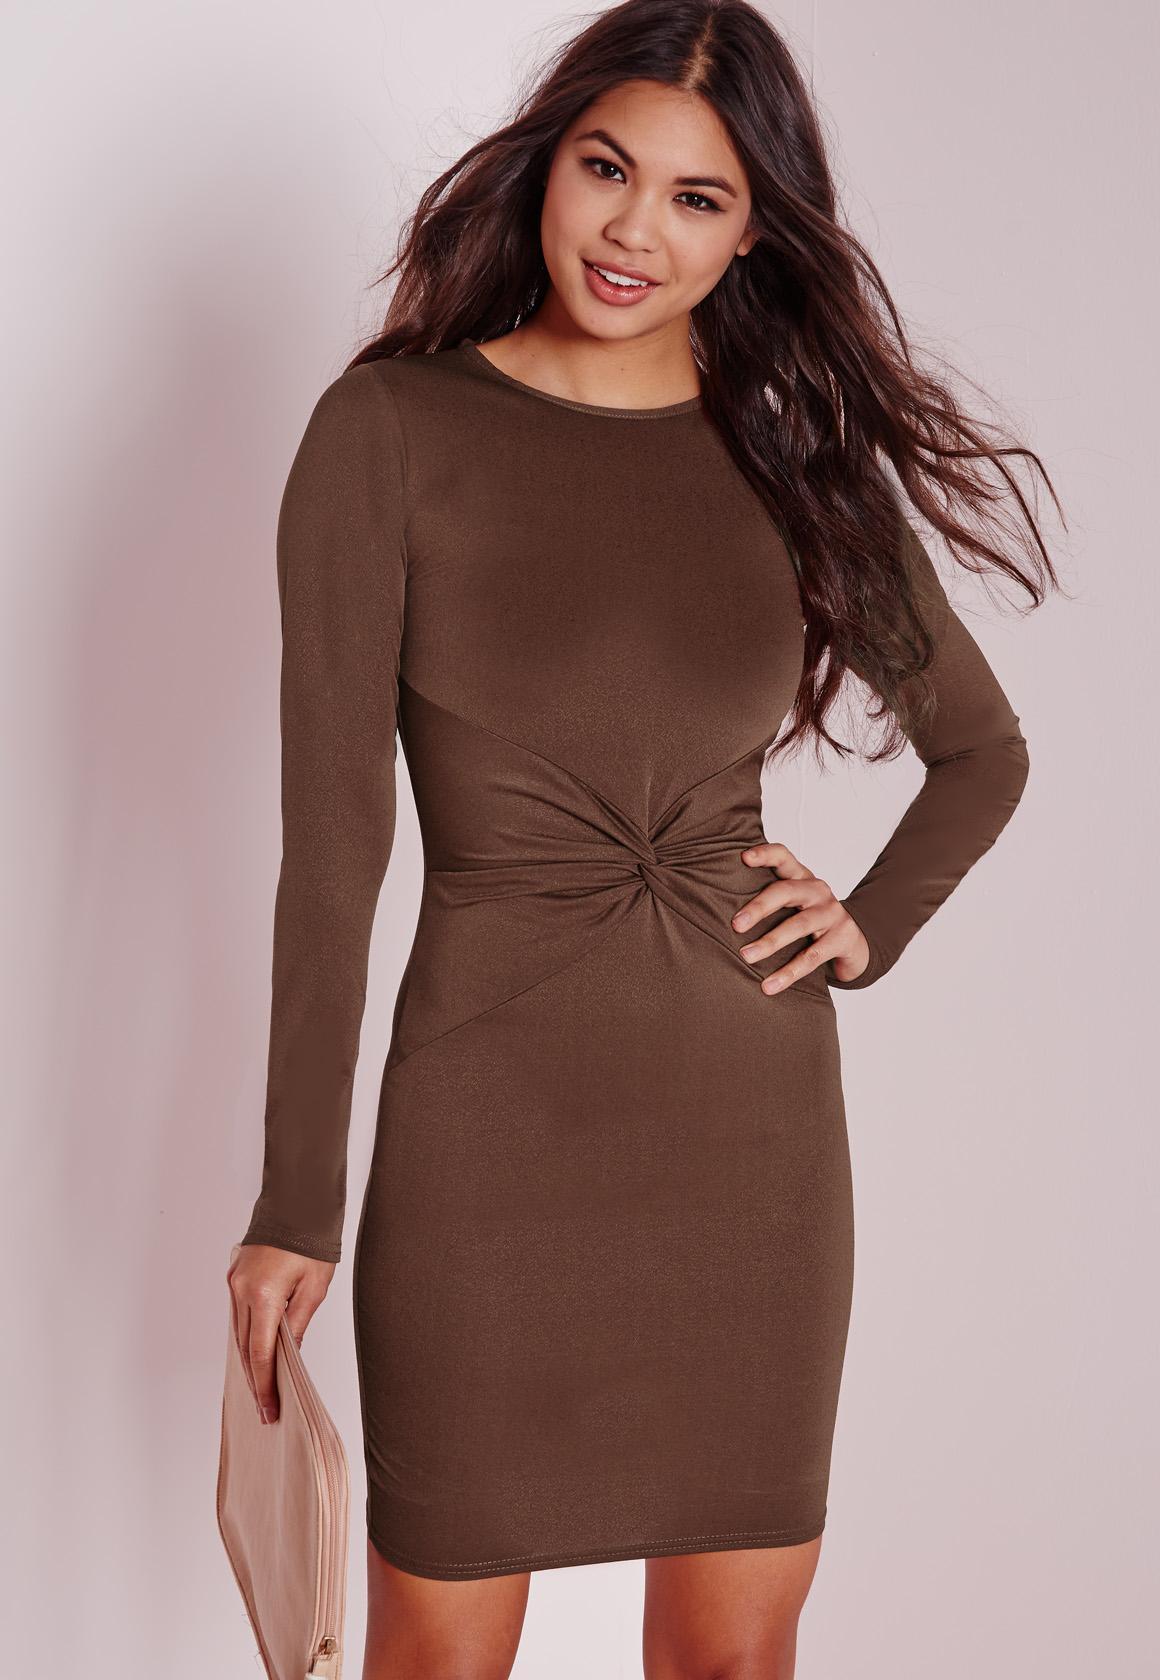 chocolate brown dresses